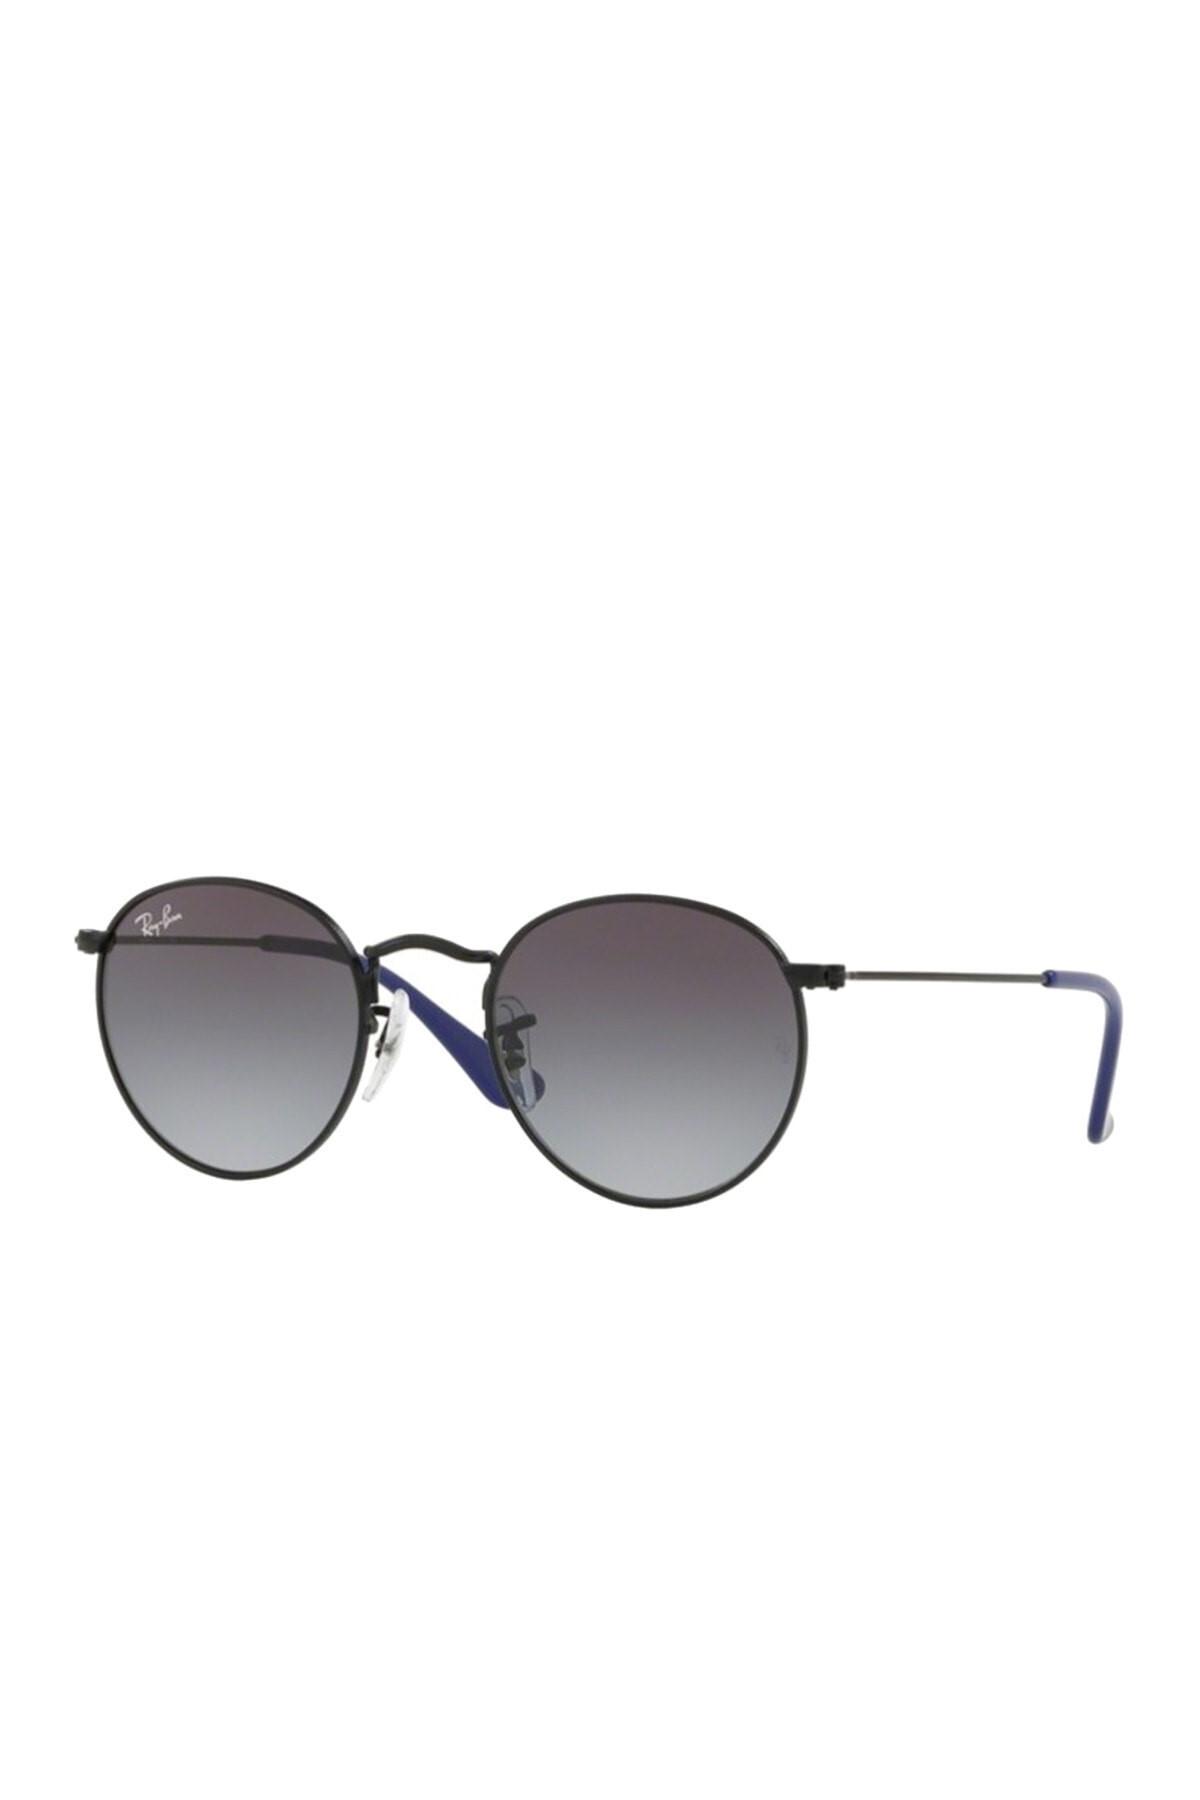 Óculos de Sol Ray-Ban Infantil Jr Round RJ9547S 201/8G